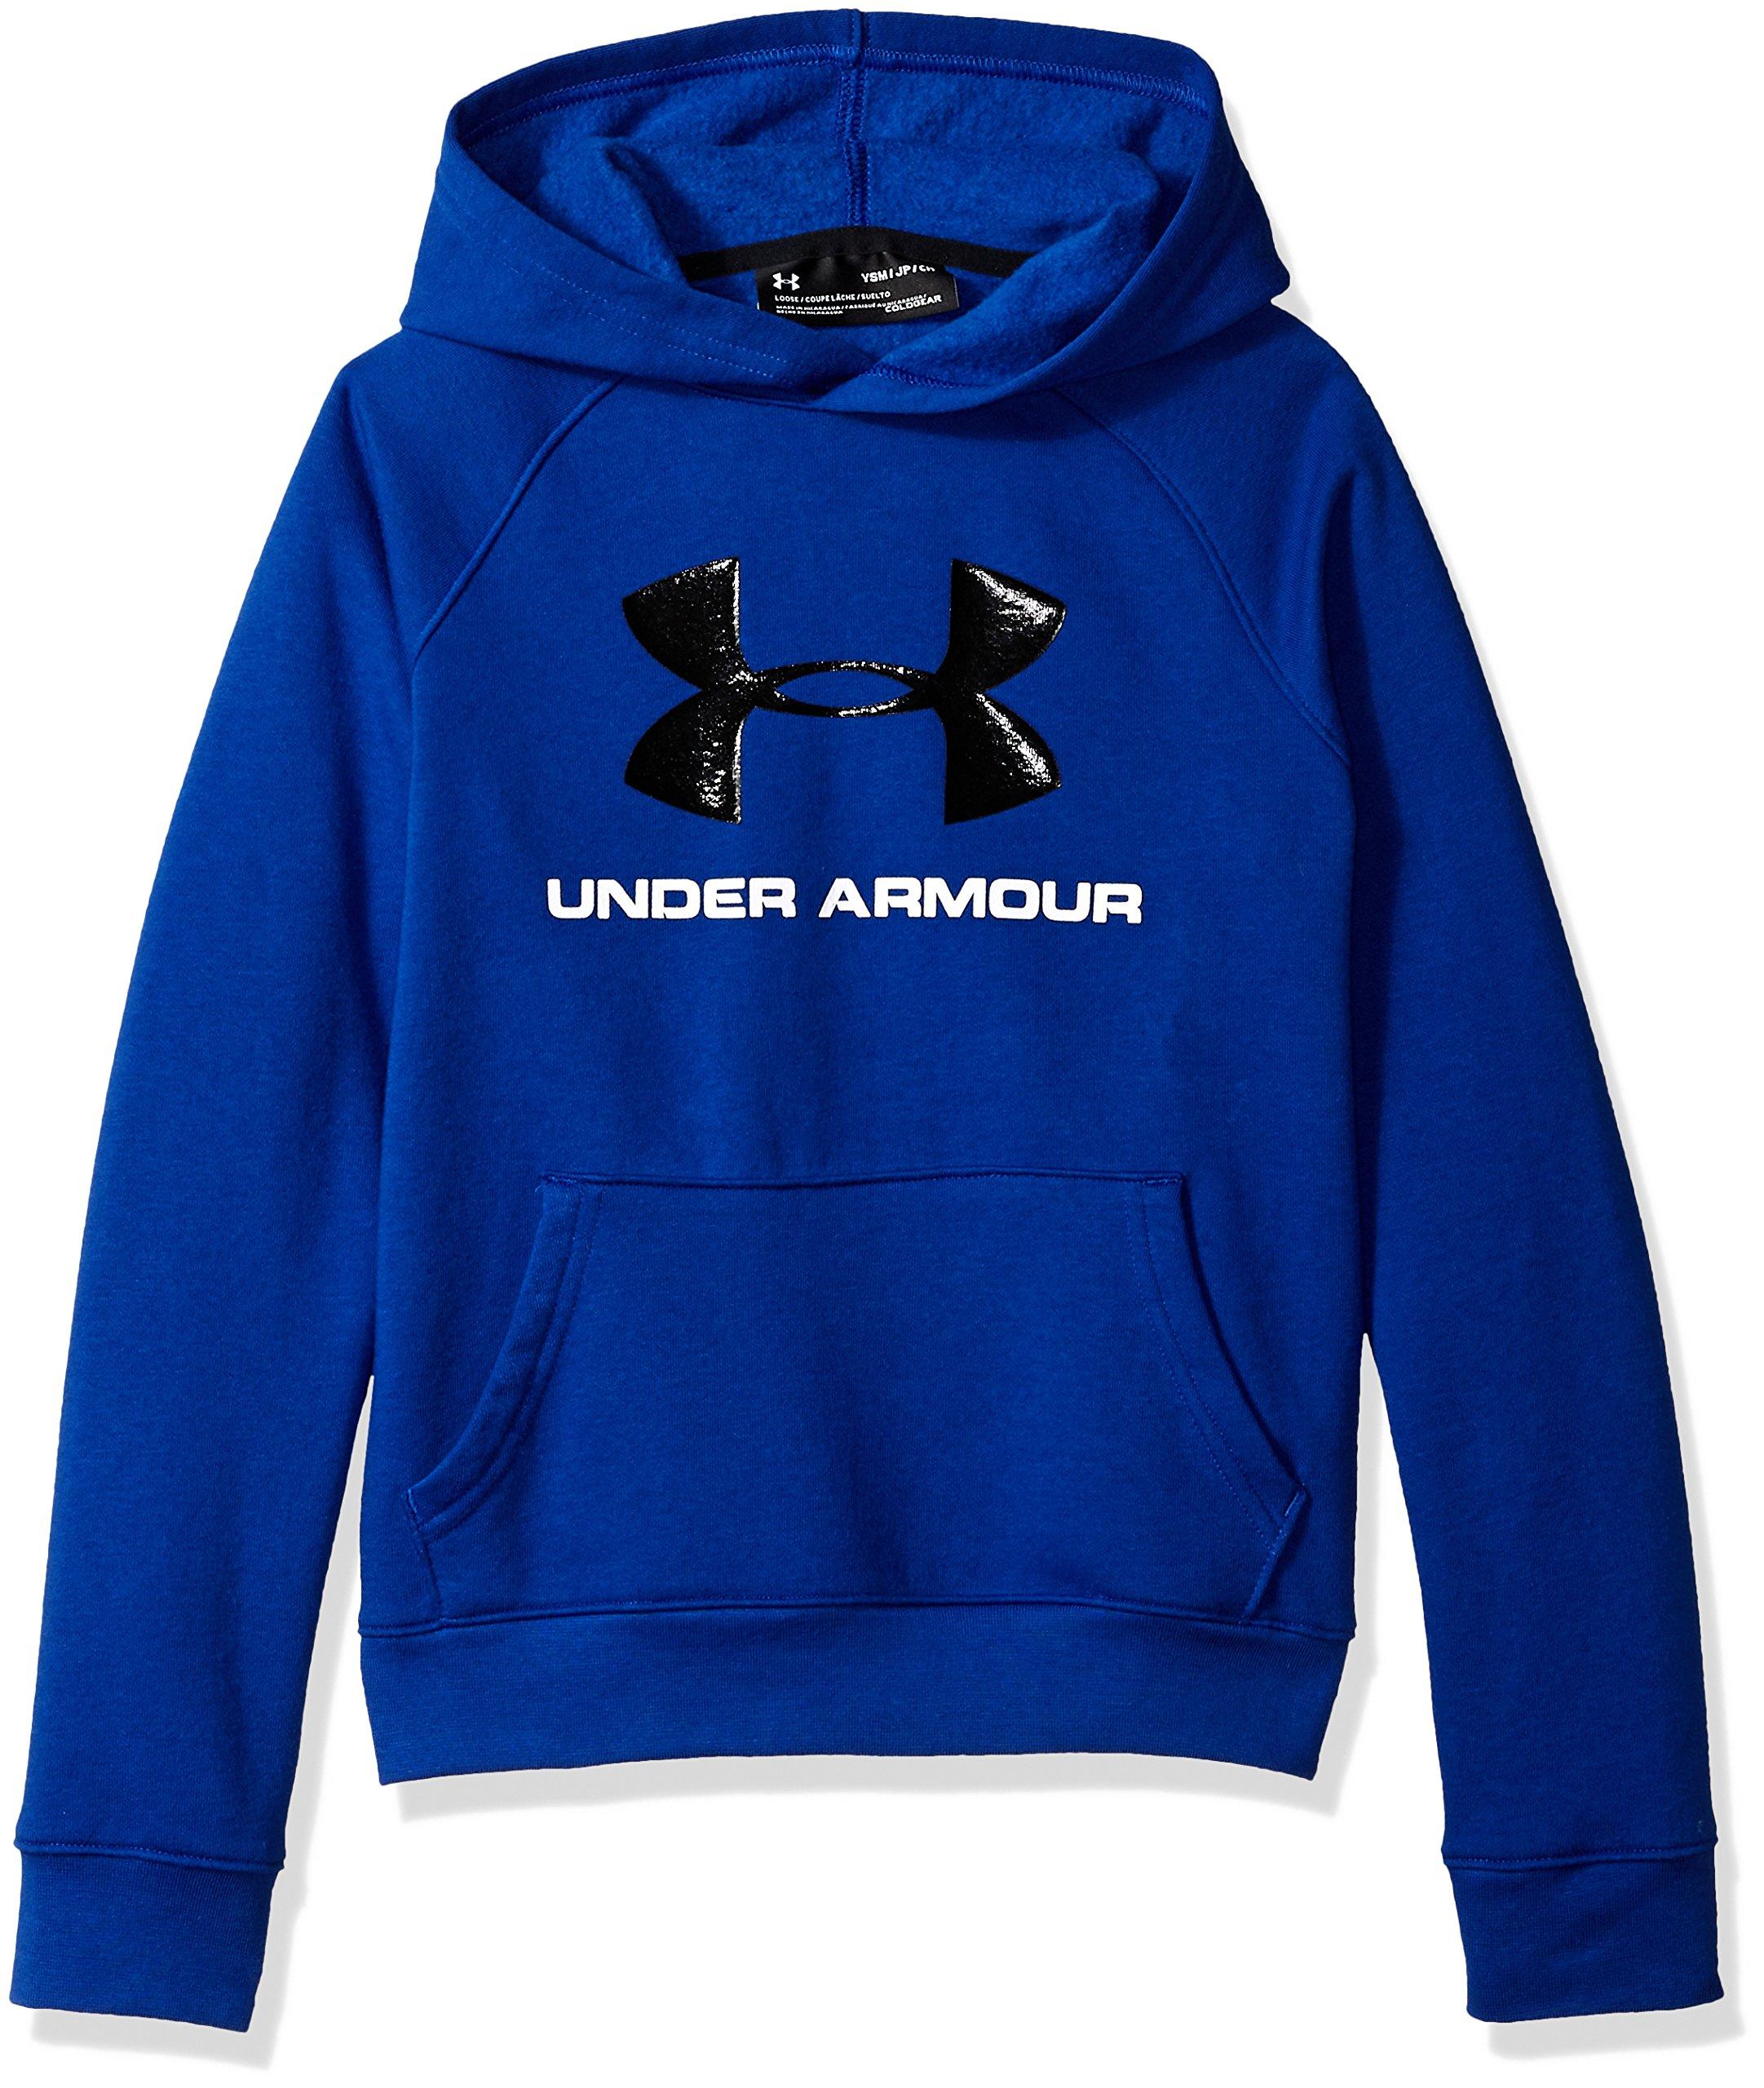 610ed2f7e Galleon - Under Armour Boys Rival Logo Hoodie, Royal (400)/Black, Youth  Medium